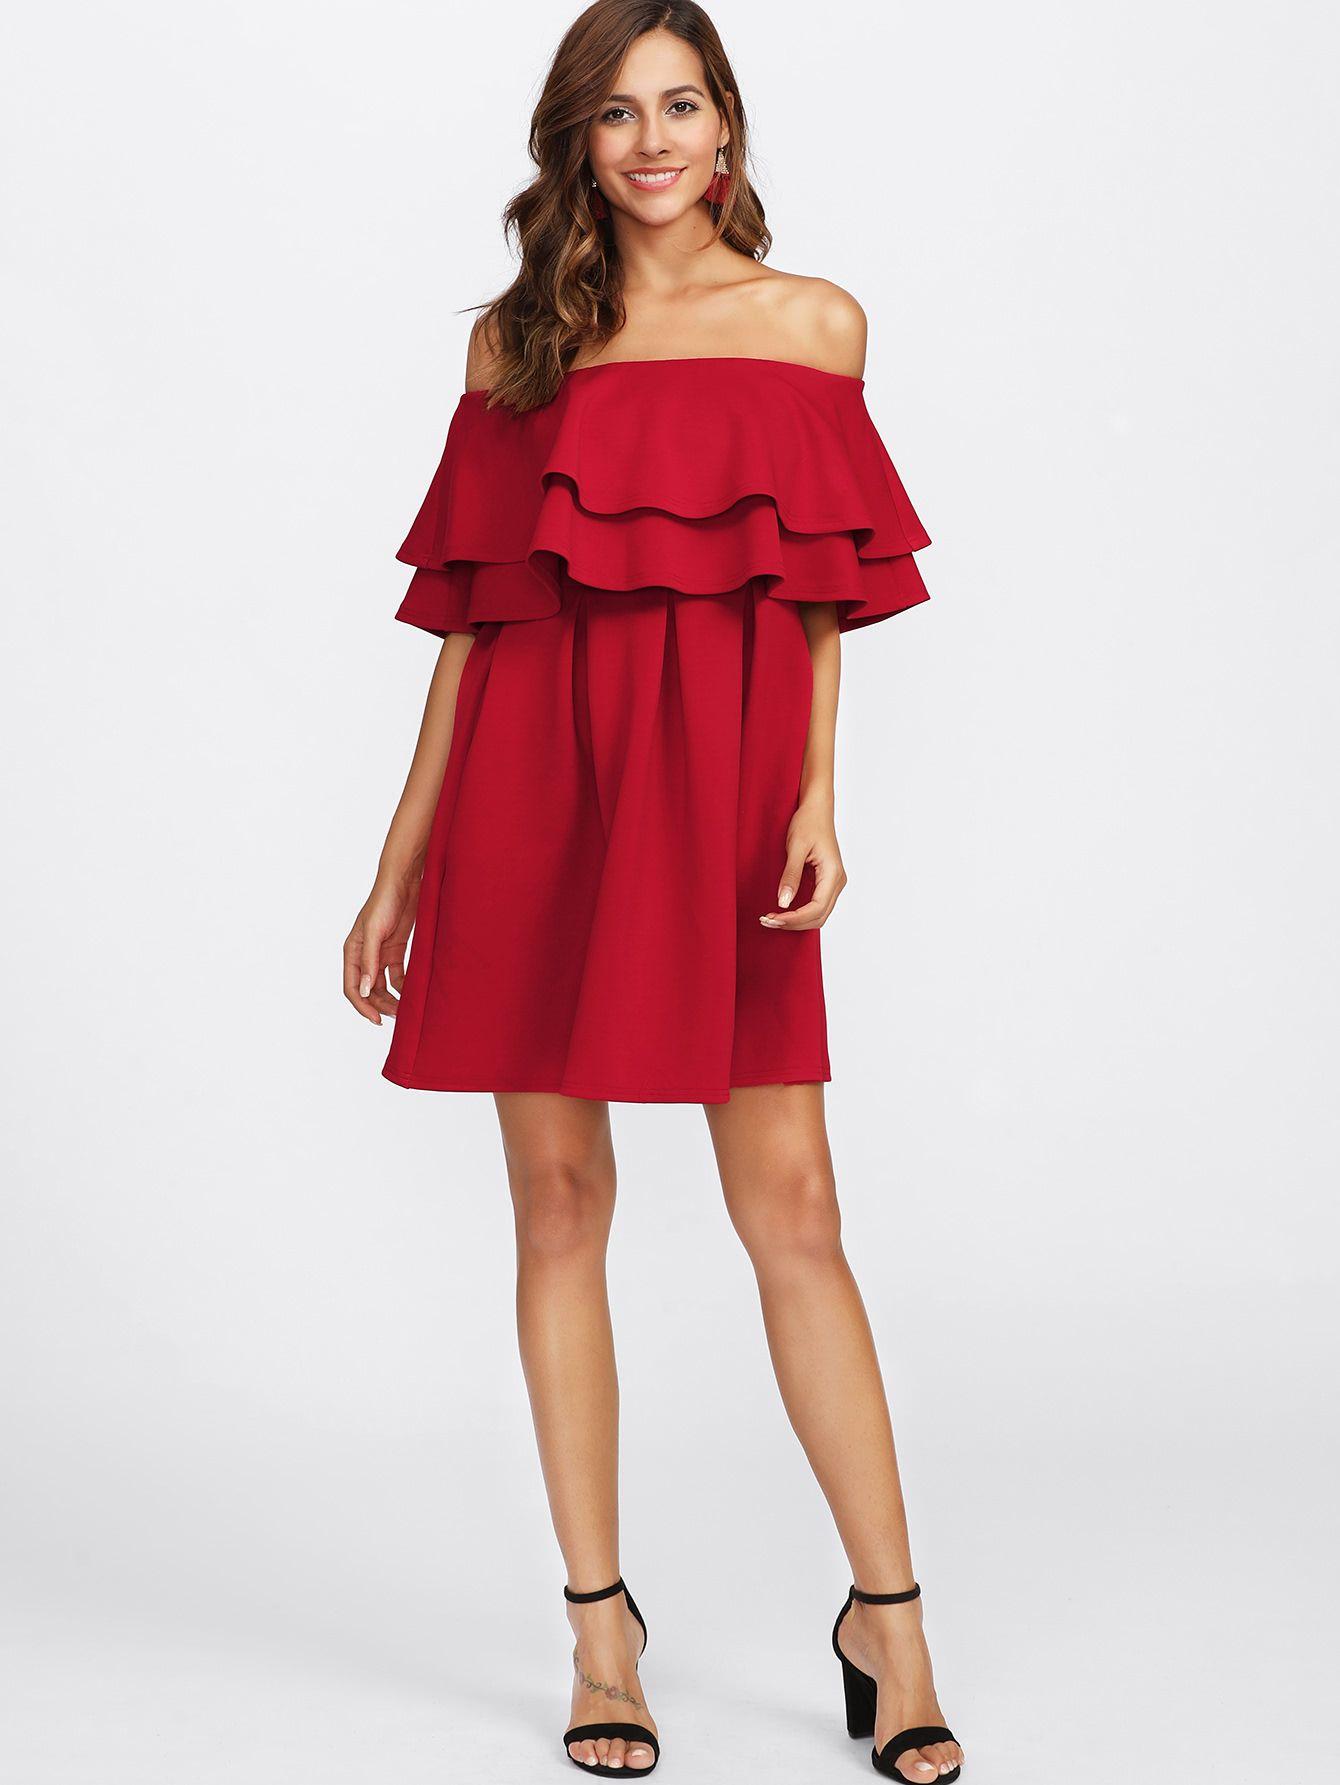 1039483e7b2 Shop Layered Flounce Off Shoulder Dress online. SheIn offers Layered  Flounce Off Shoulder Dress